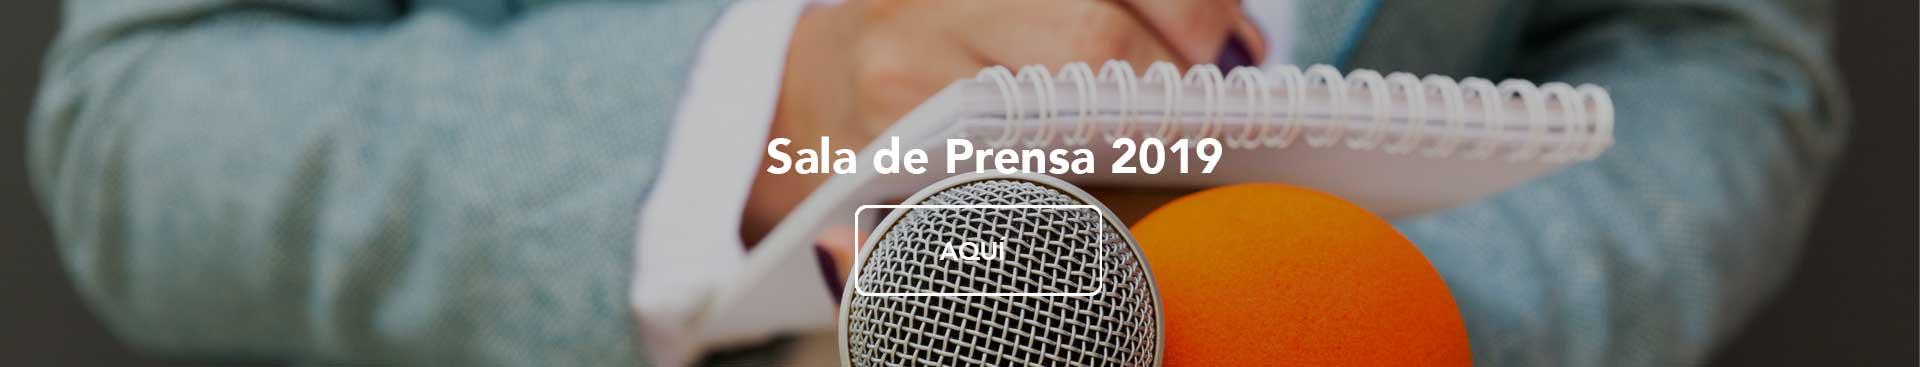 Sala de Prensa Agremia 2019